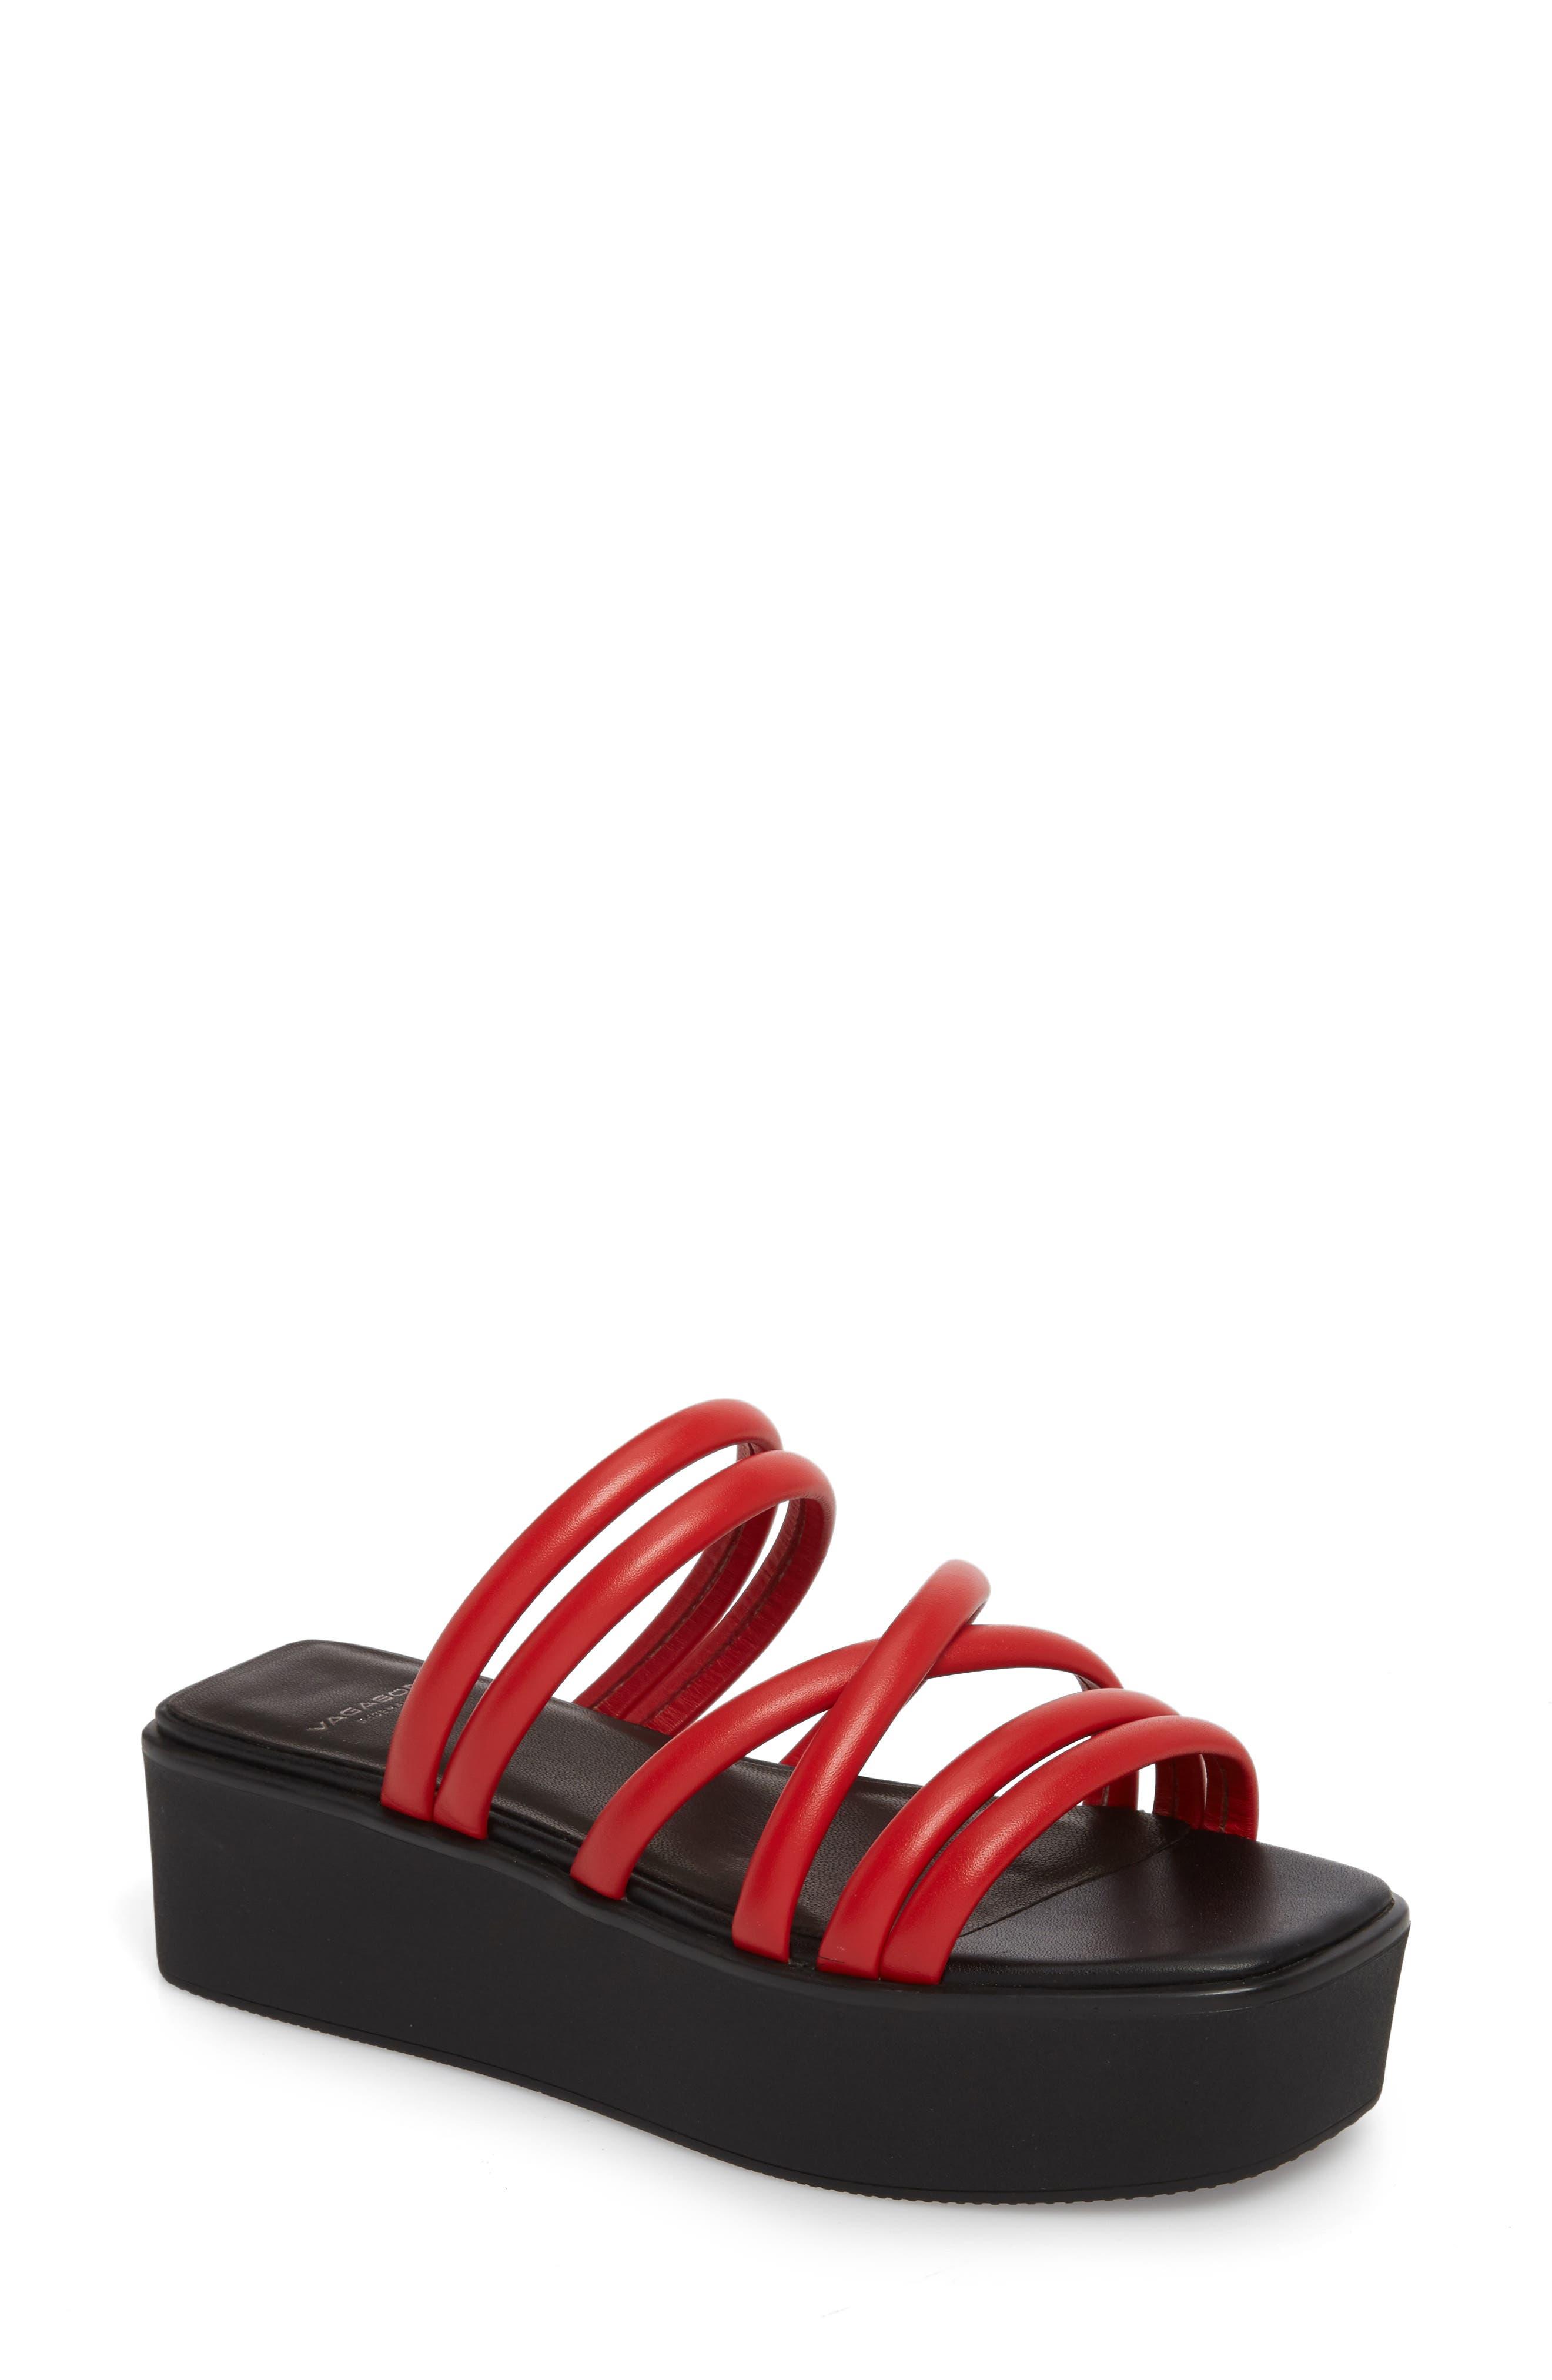 Vagabond Shoemakers Bonnie Platform Sandal, Red